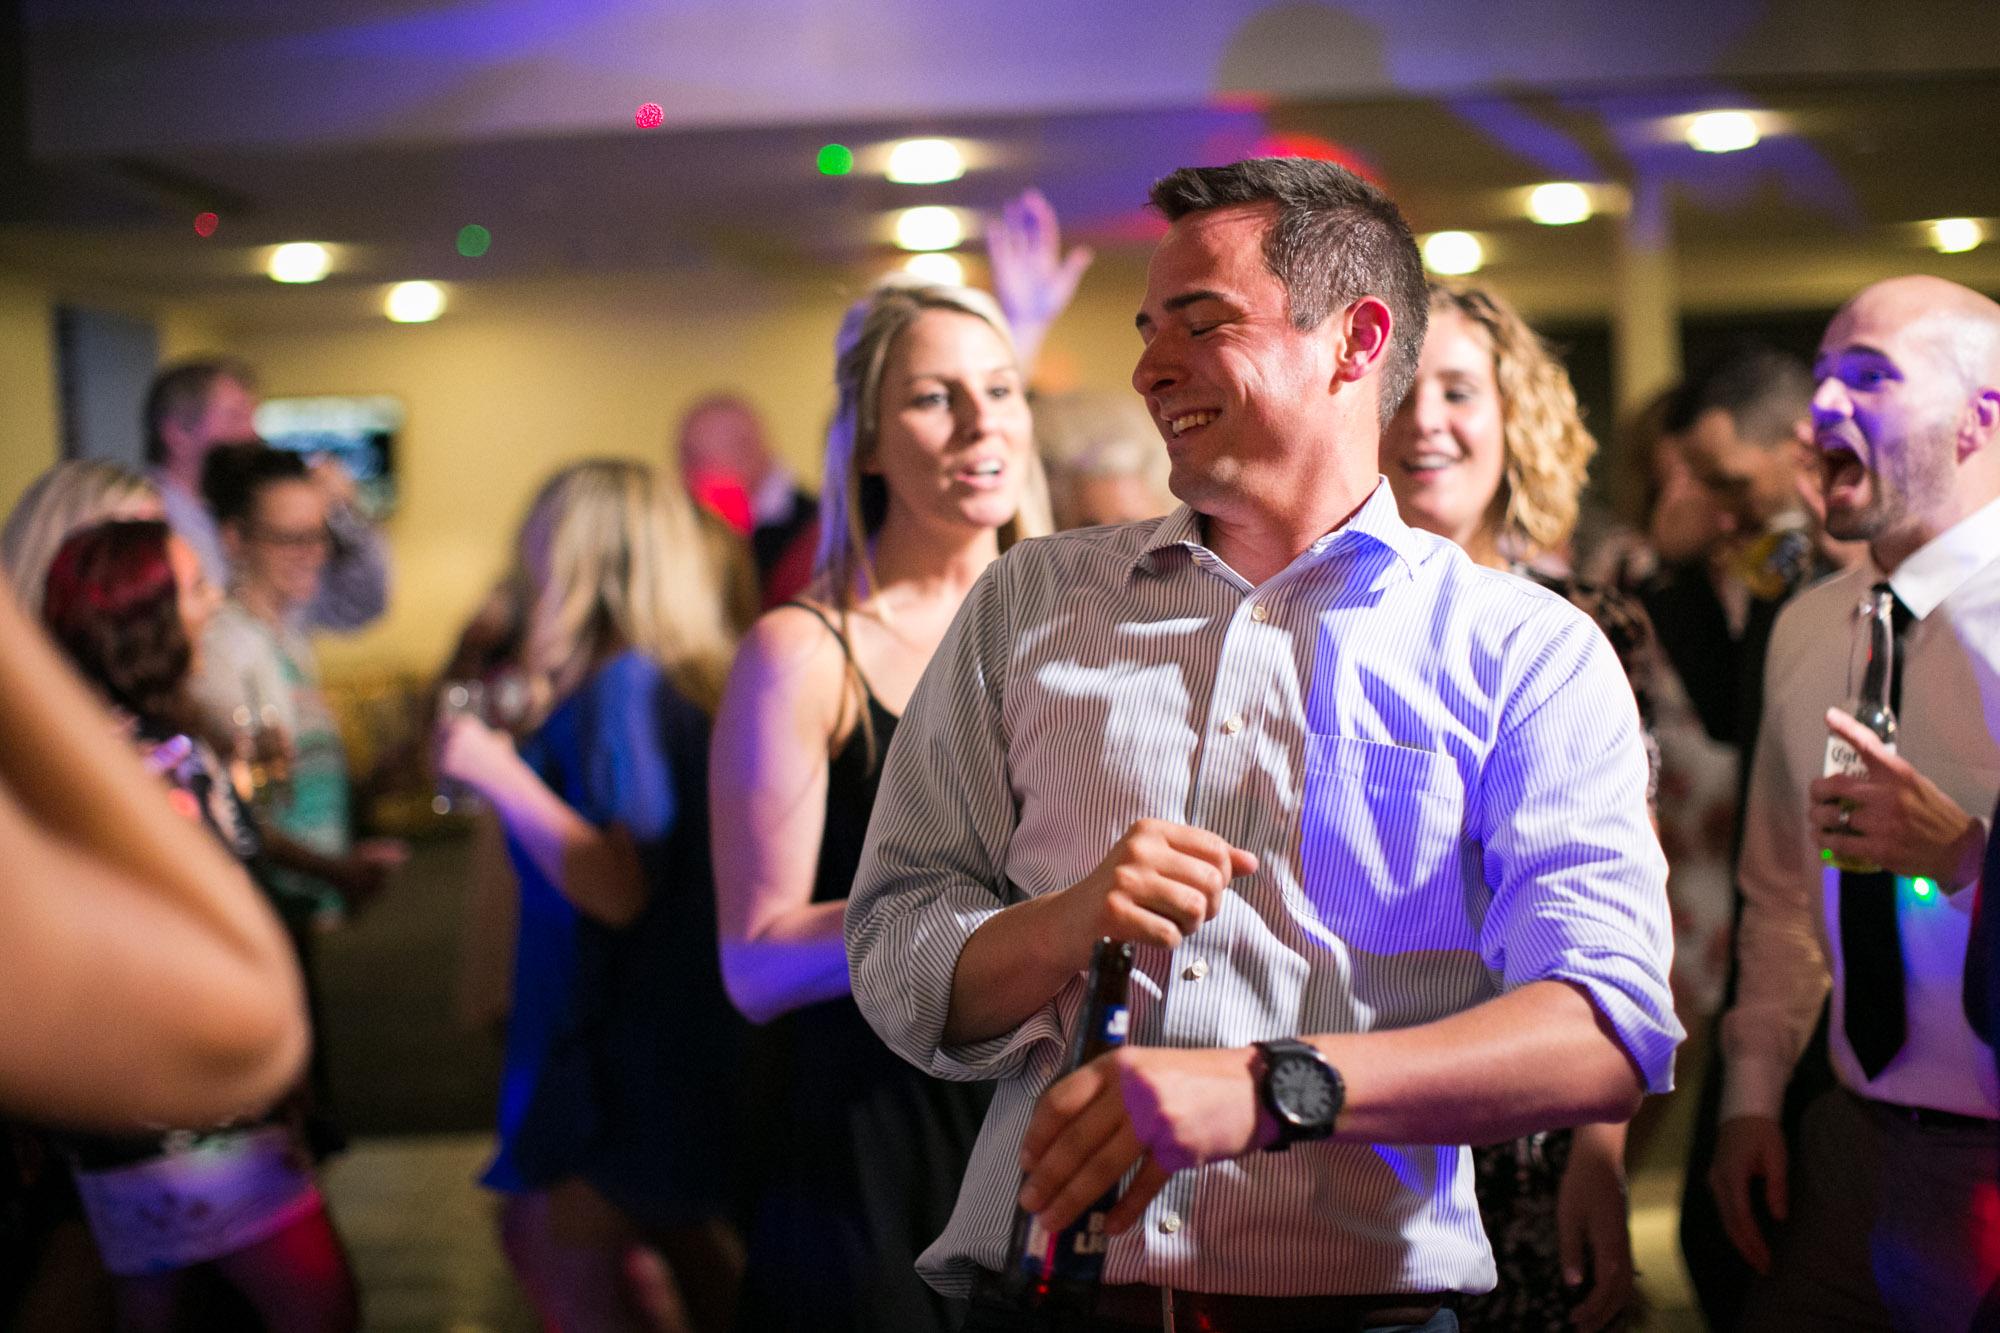 hensville-wedding-downtown-toledo-ohio (103 of 103).jpg